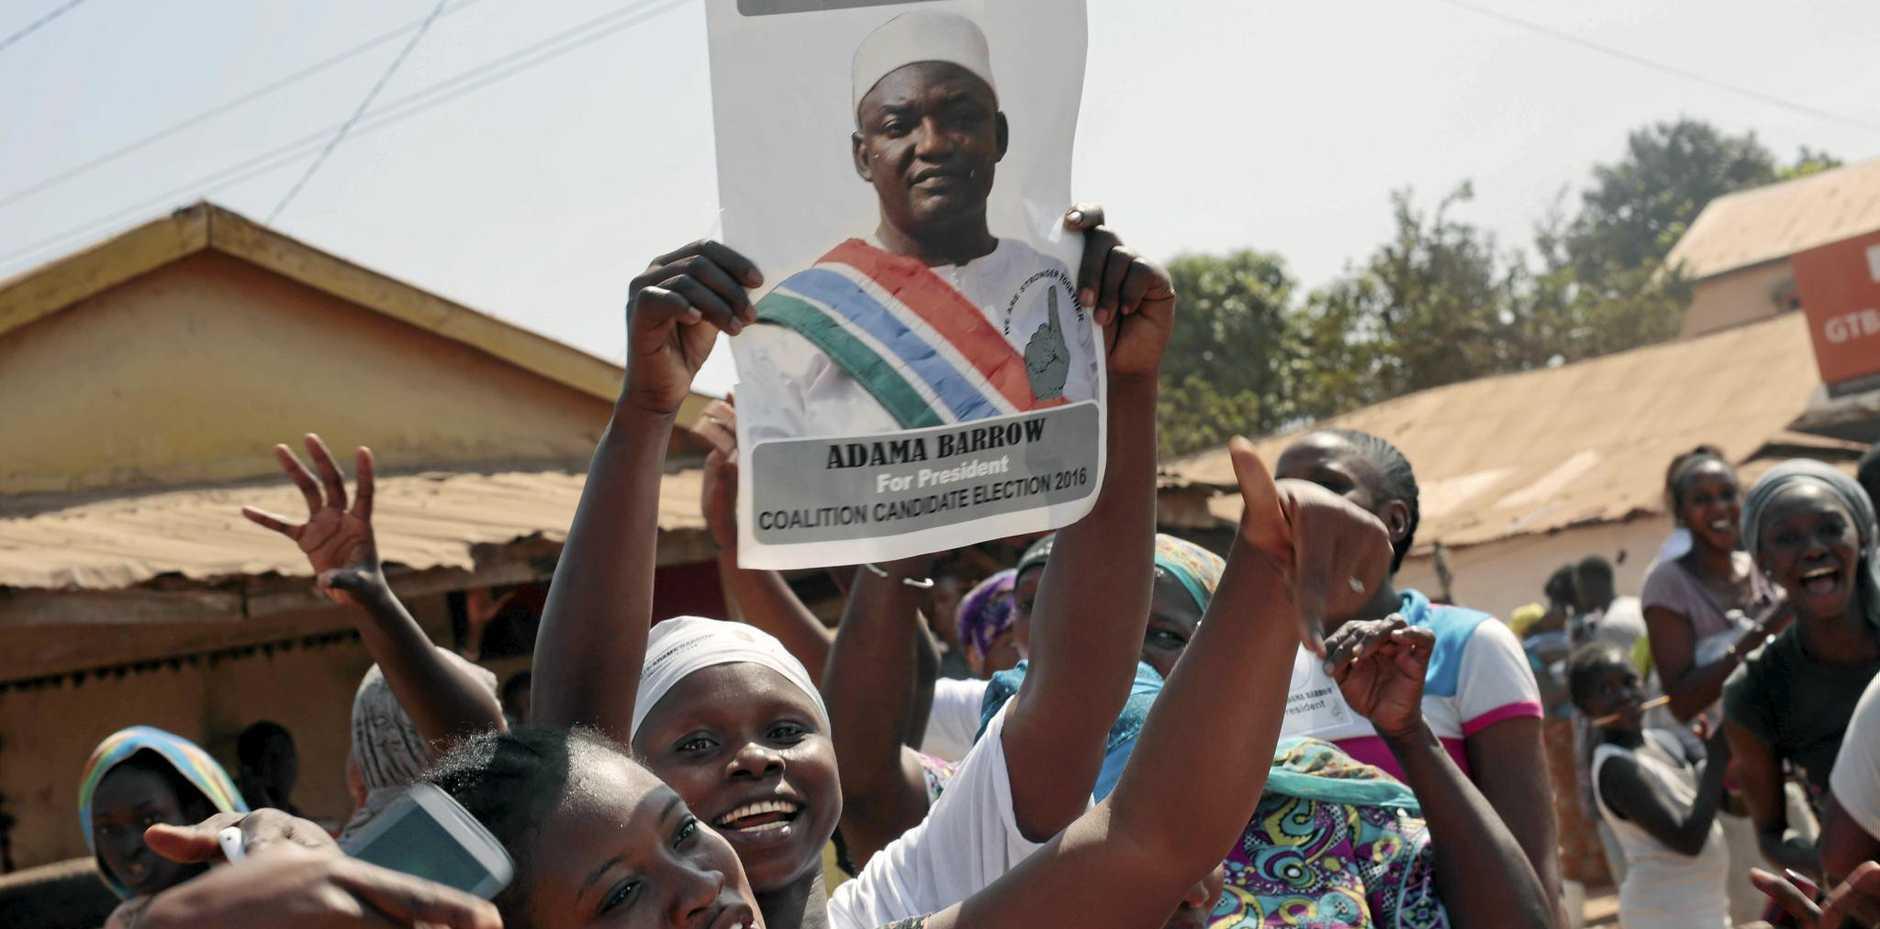 Gambians celebrate the victory of Adama Barrow against long-time president Yahya Jammeh in the streets of Serrekunda.